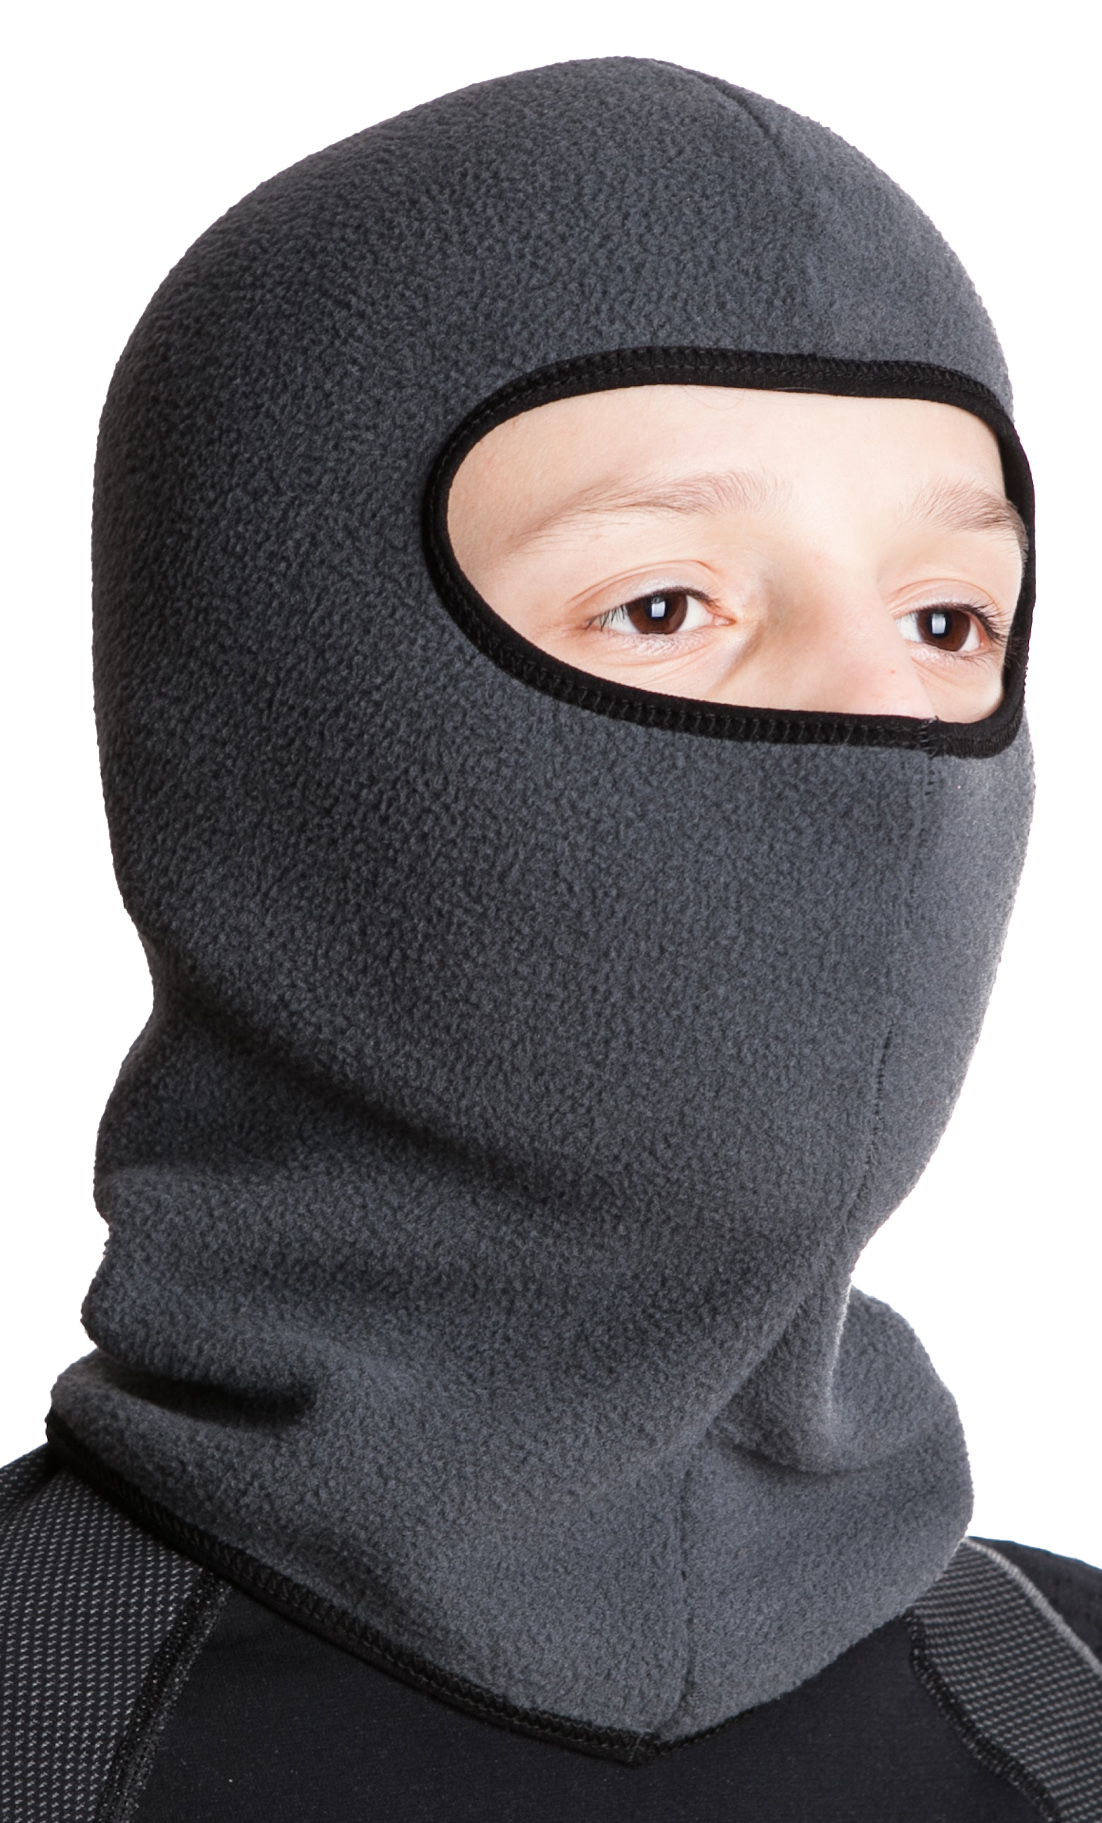 kinder fleece sturmhaube skimaske gesichtsmaske verschiedene gr e ebay. Black Bedroom Furniture Sets. Home Design Ideas